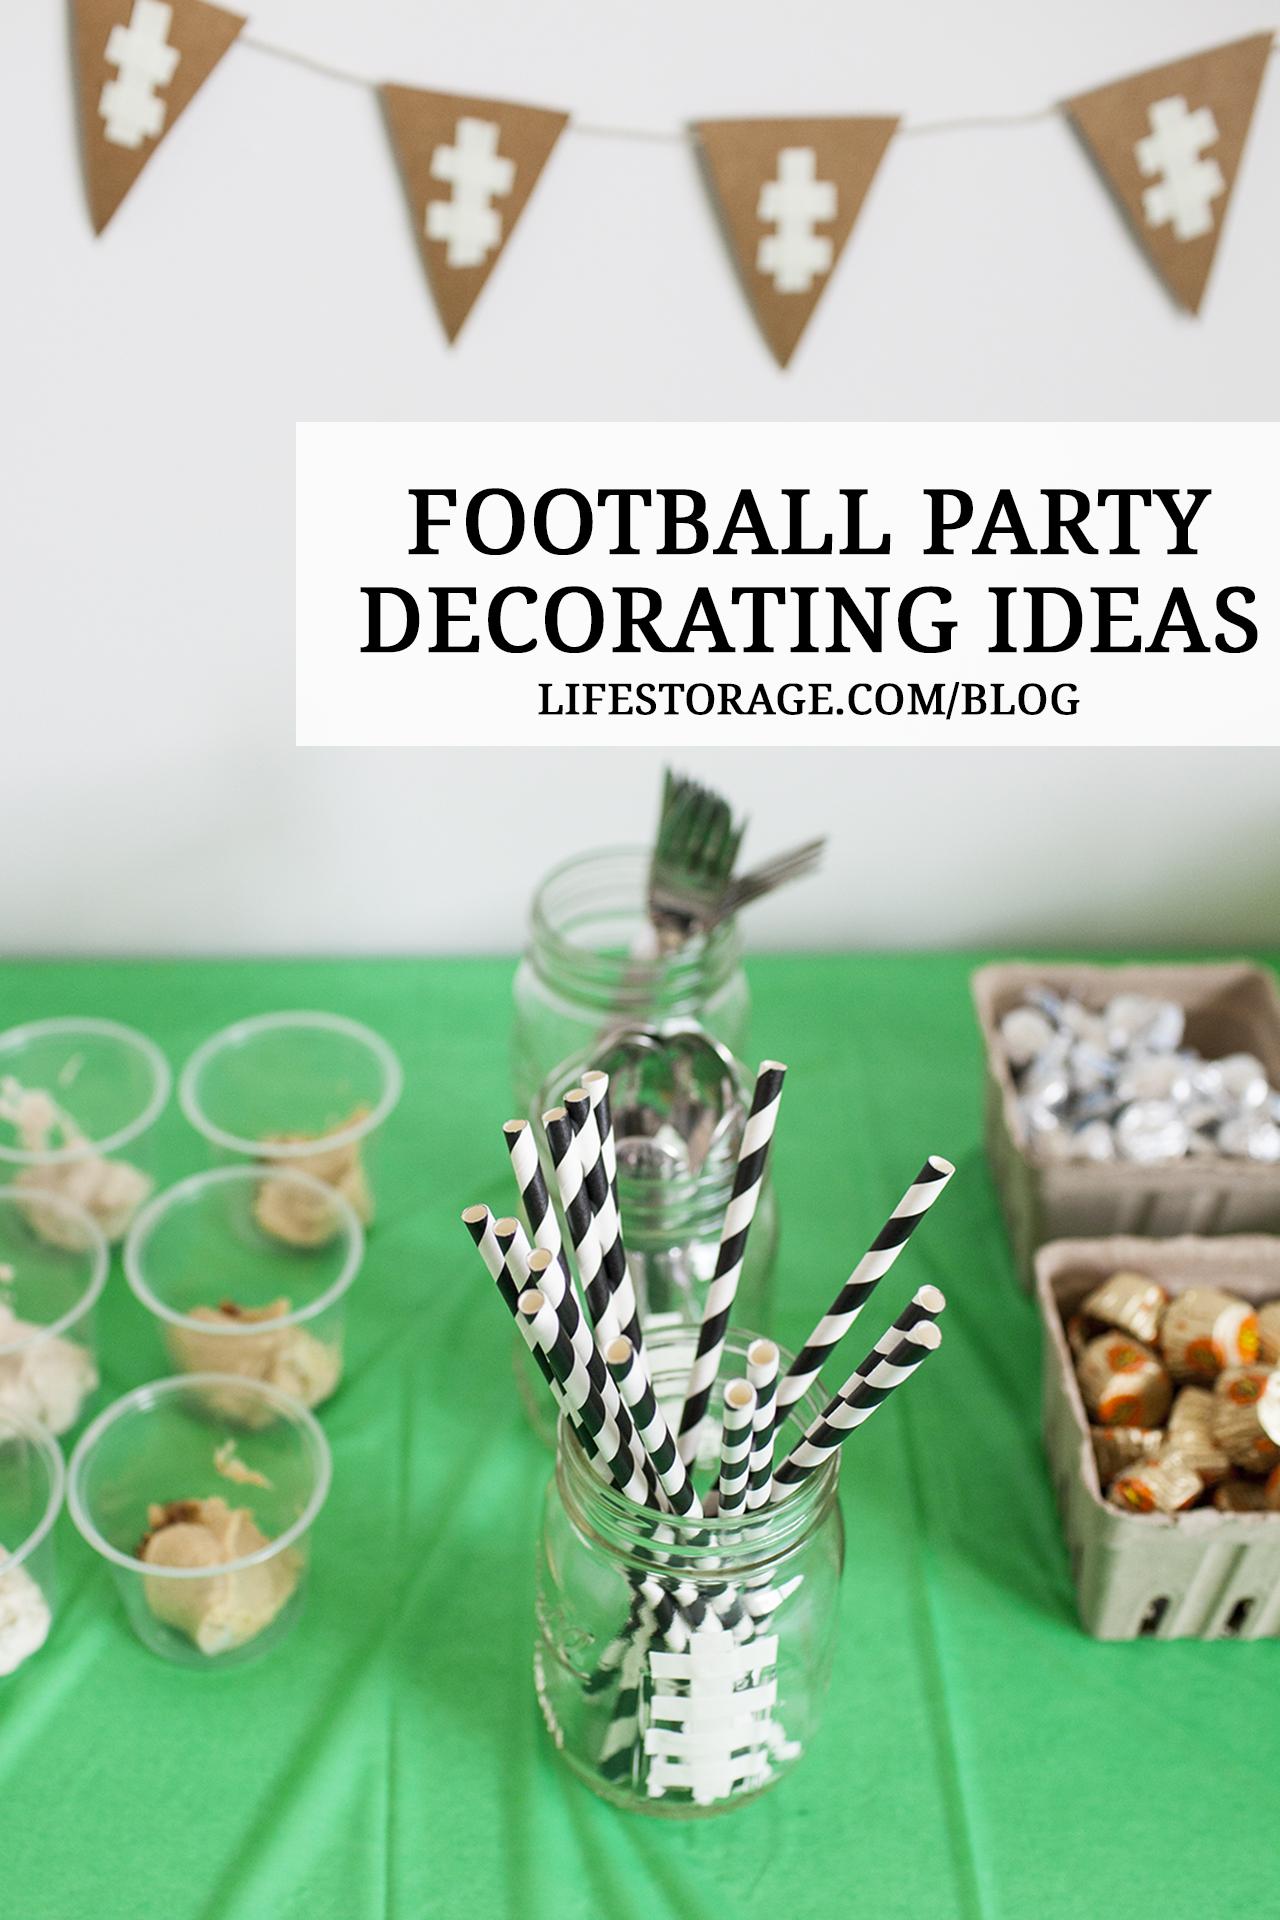 Football party decor ideas - Mason jar DIY